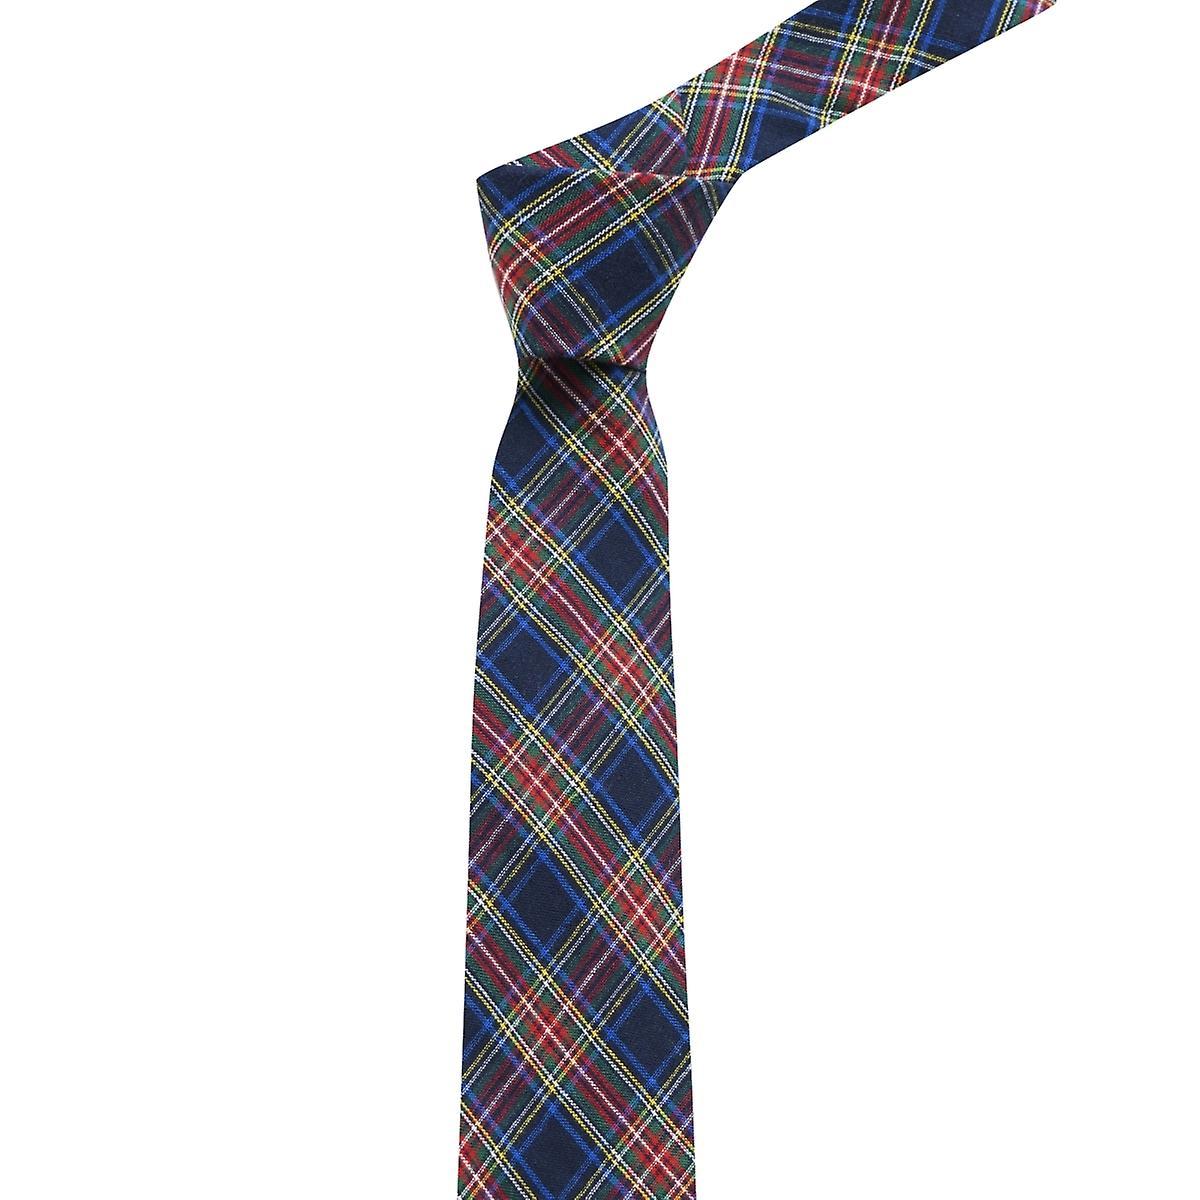 Traditional Navy Blue Tartan Tie, Check, Plaid